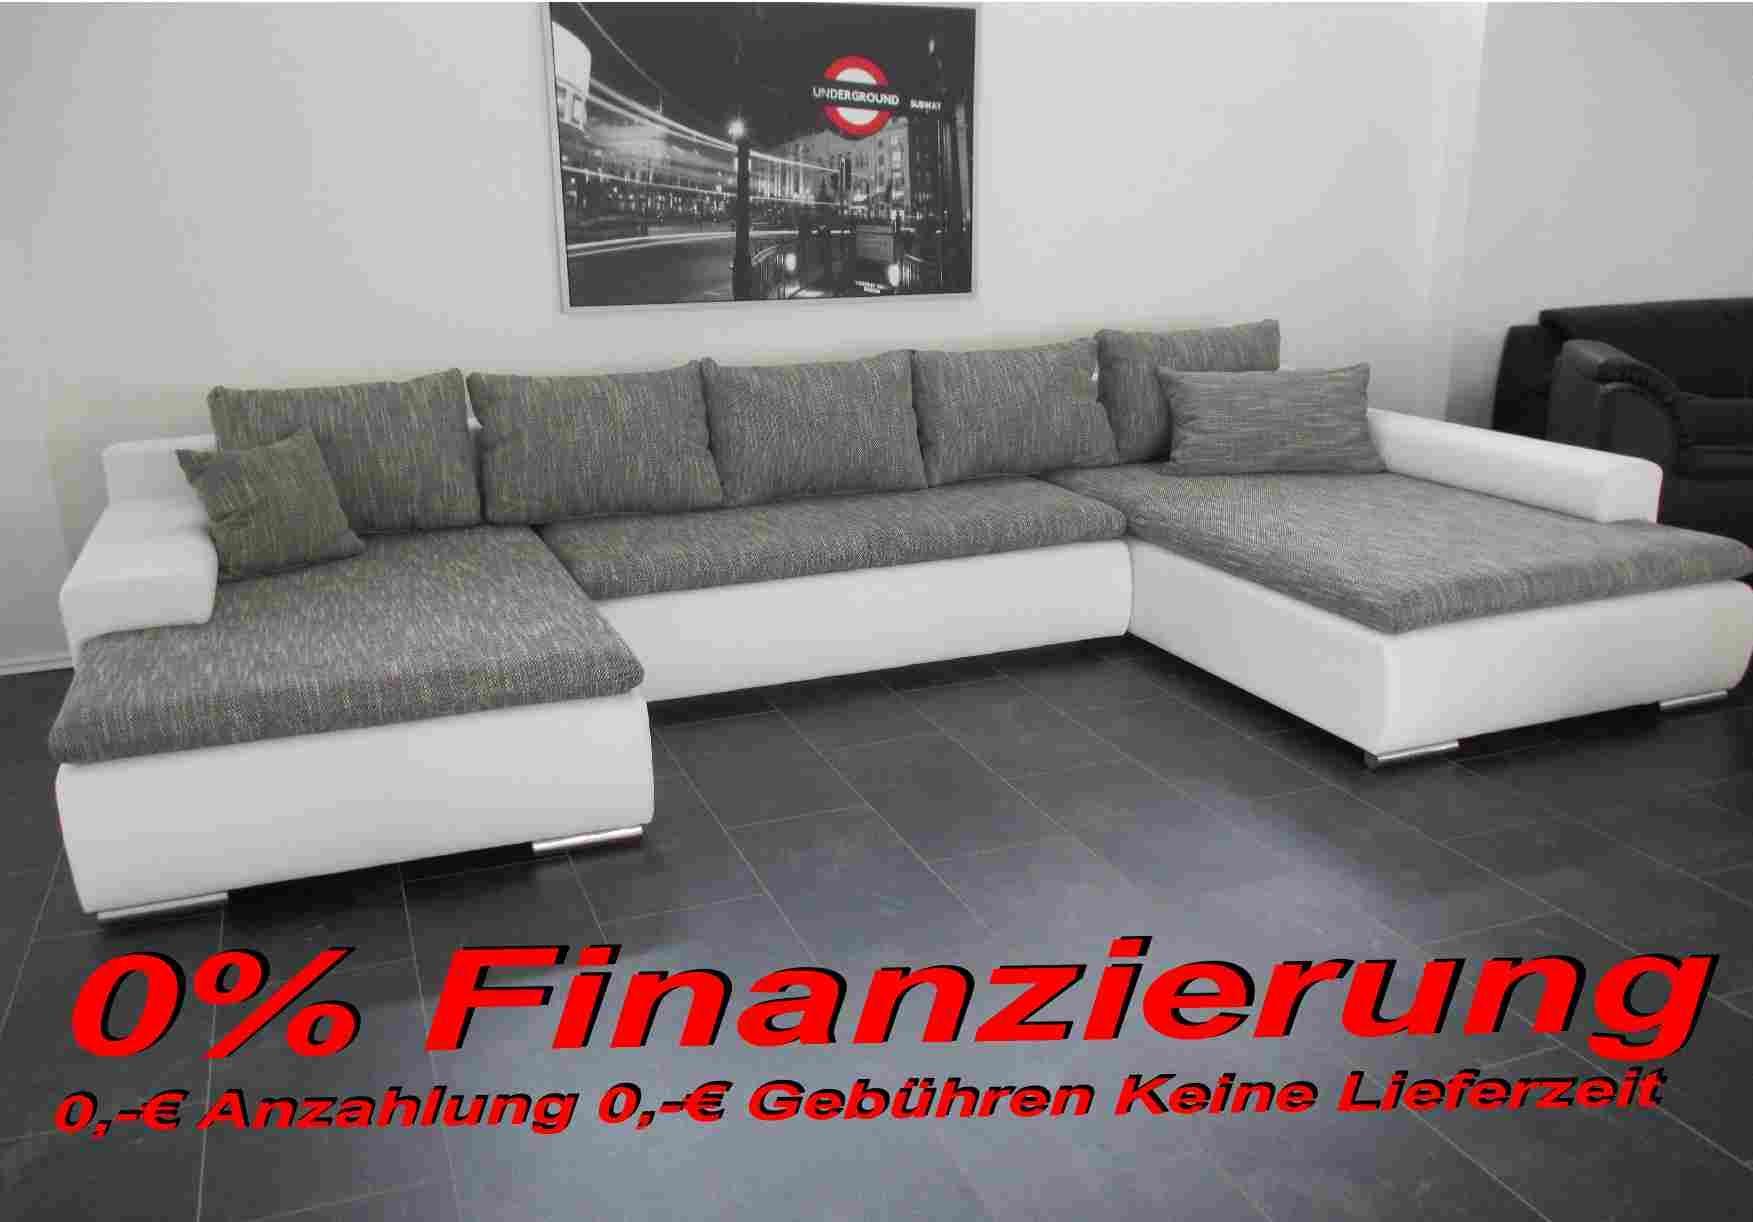 Sofa Lagerverkauf Fabrikverkauf Elkenroth Polstermobel Wohnlandschaften Trendsofas Sofas Sofort Ab Lager Www Sofa Laverkauf De Couch Home Sofa Couch